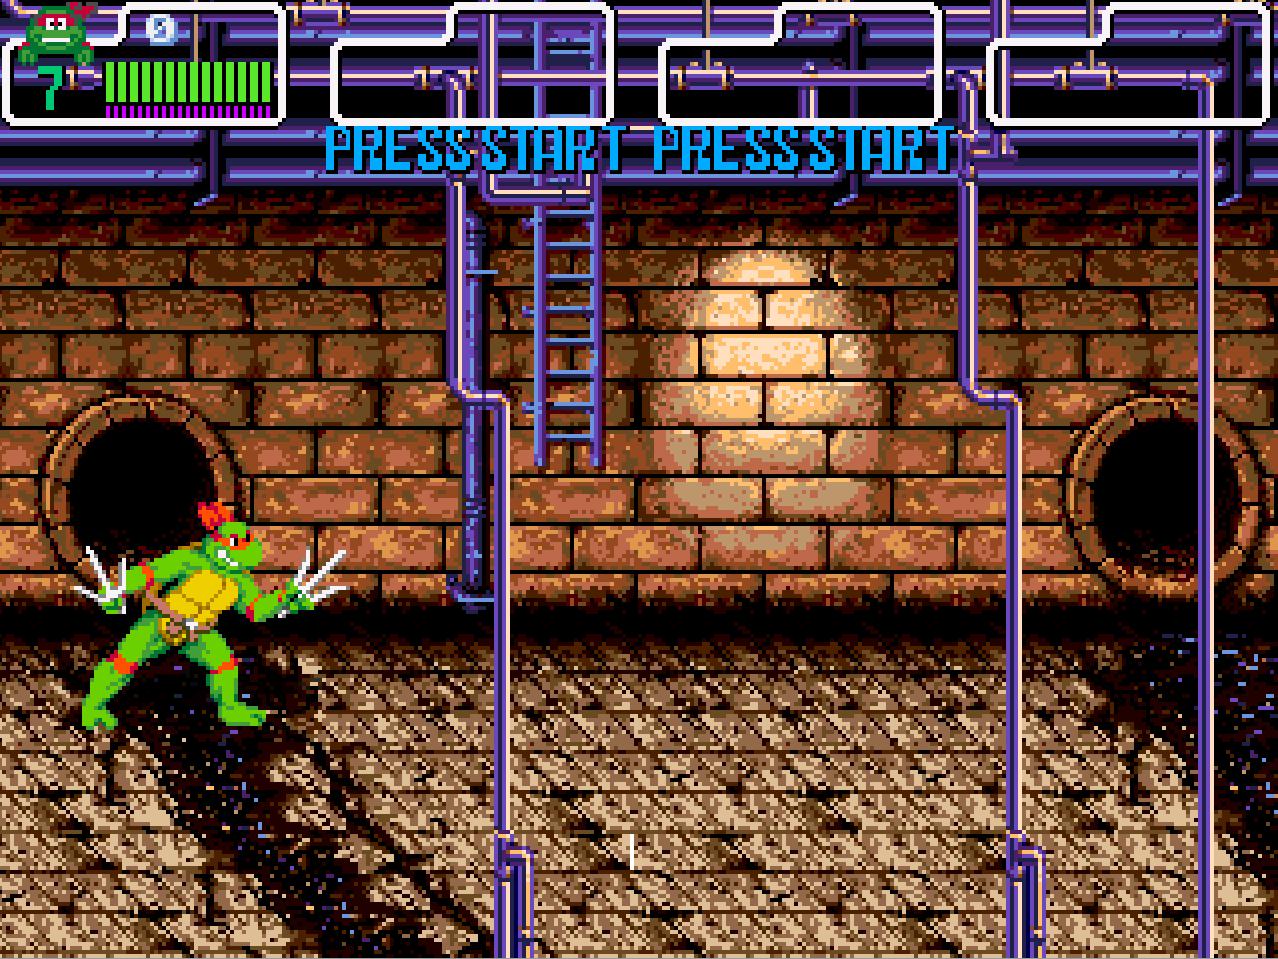 Raphael wanders the sewer